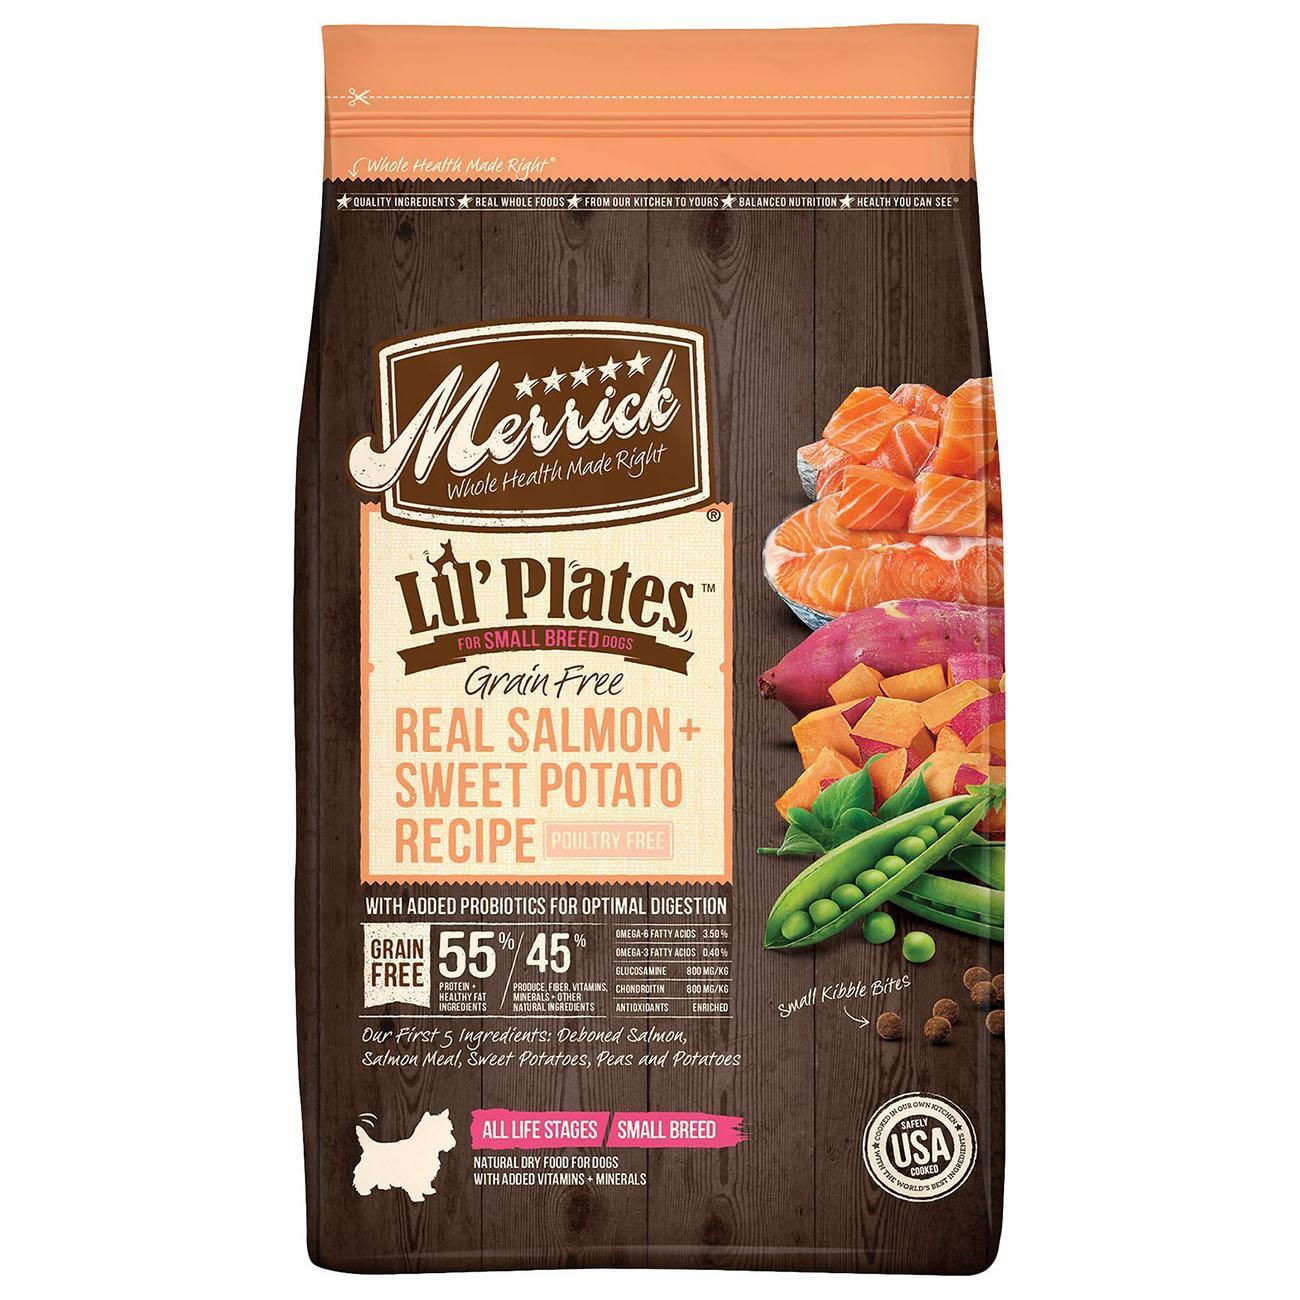 Merrick Lil'Plates Small Breed Grain-Free Dry Dog Food - Real Salmon & Sweet Potato Recipe